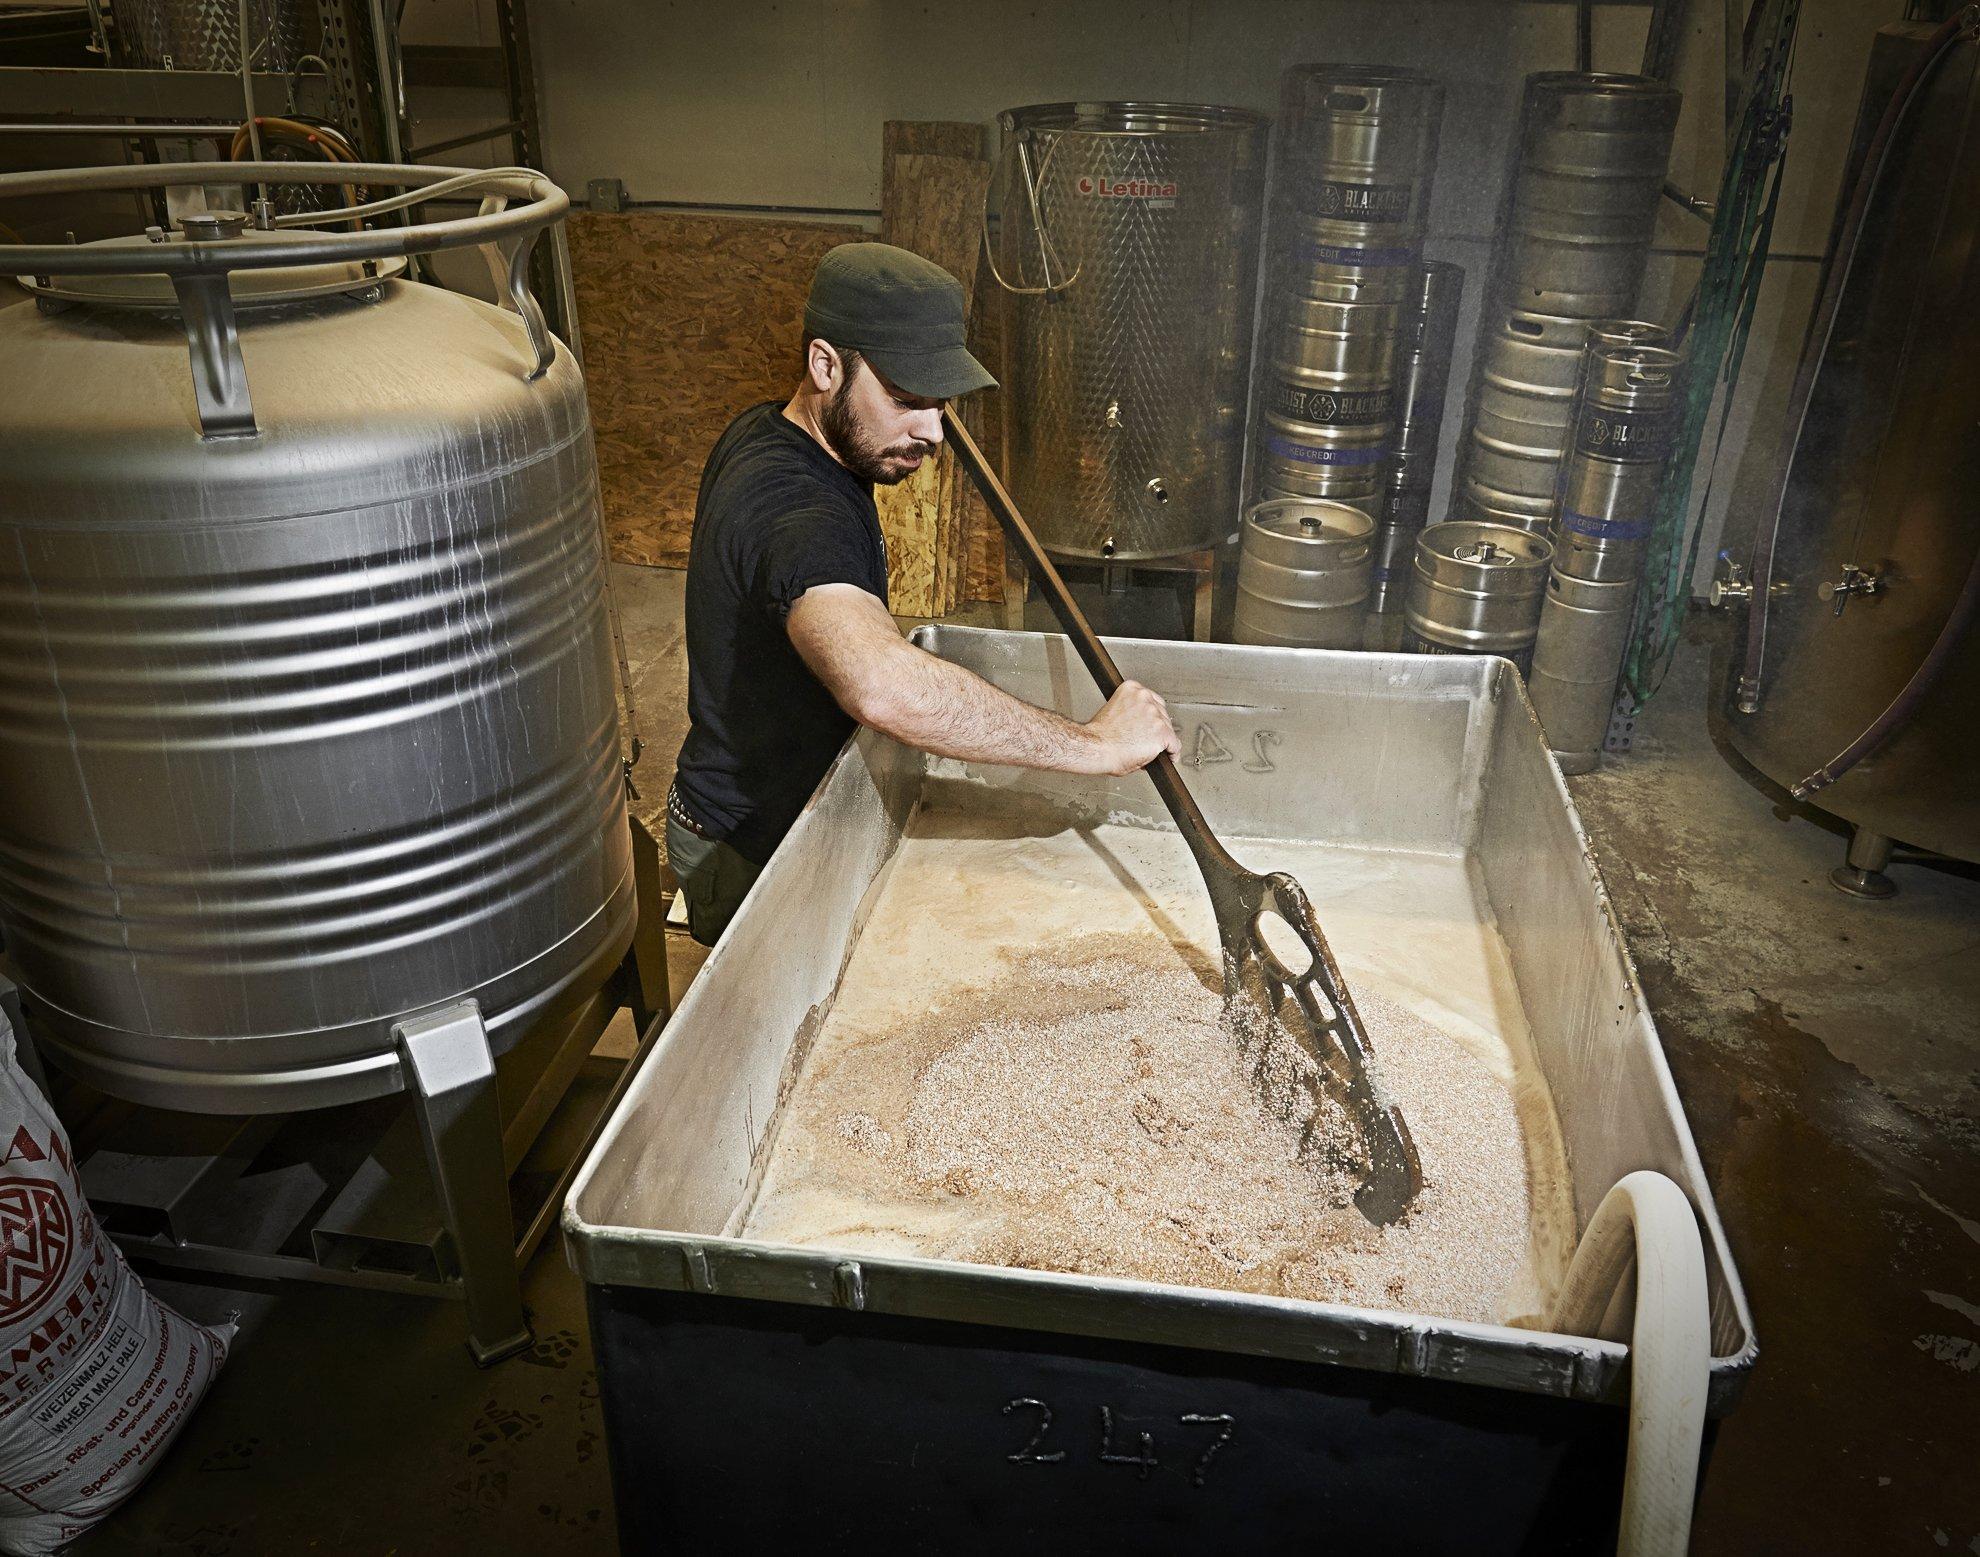 Epicurean Professional-Grade Brewers Mash Paddle (59 X 10 3/4 Inch, Slate/Nutmeg) by Epicurean (Image #4)